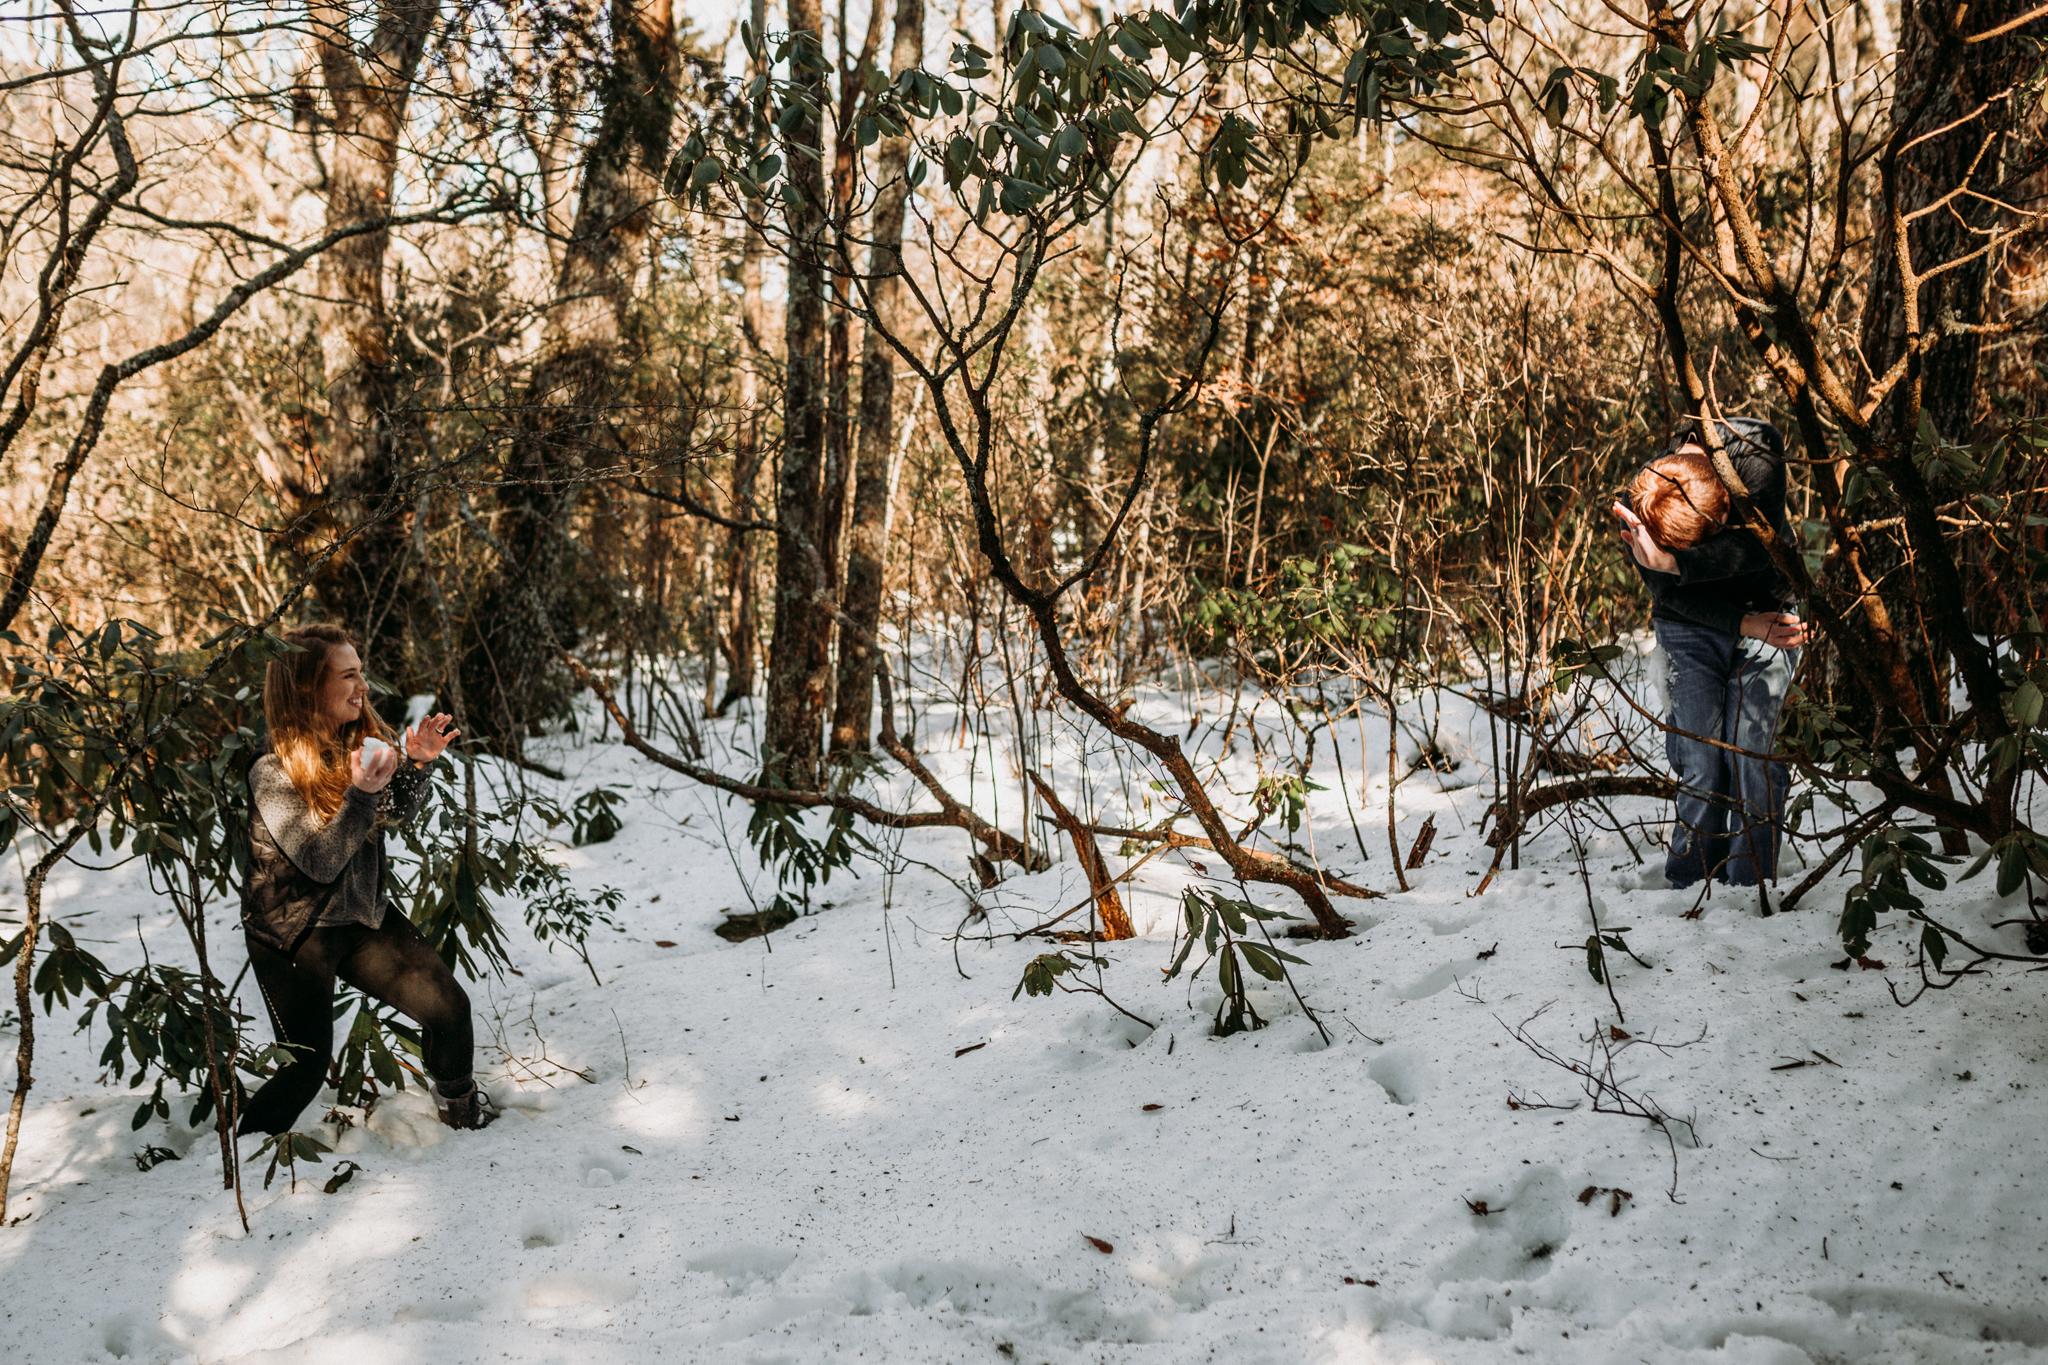 MonicaLeavellPhoto-AshleyMitch-NorthCarolina-Adventure-Engagement-Photographer-12.jpg